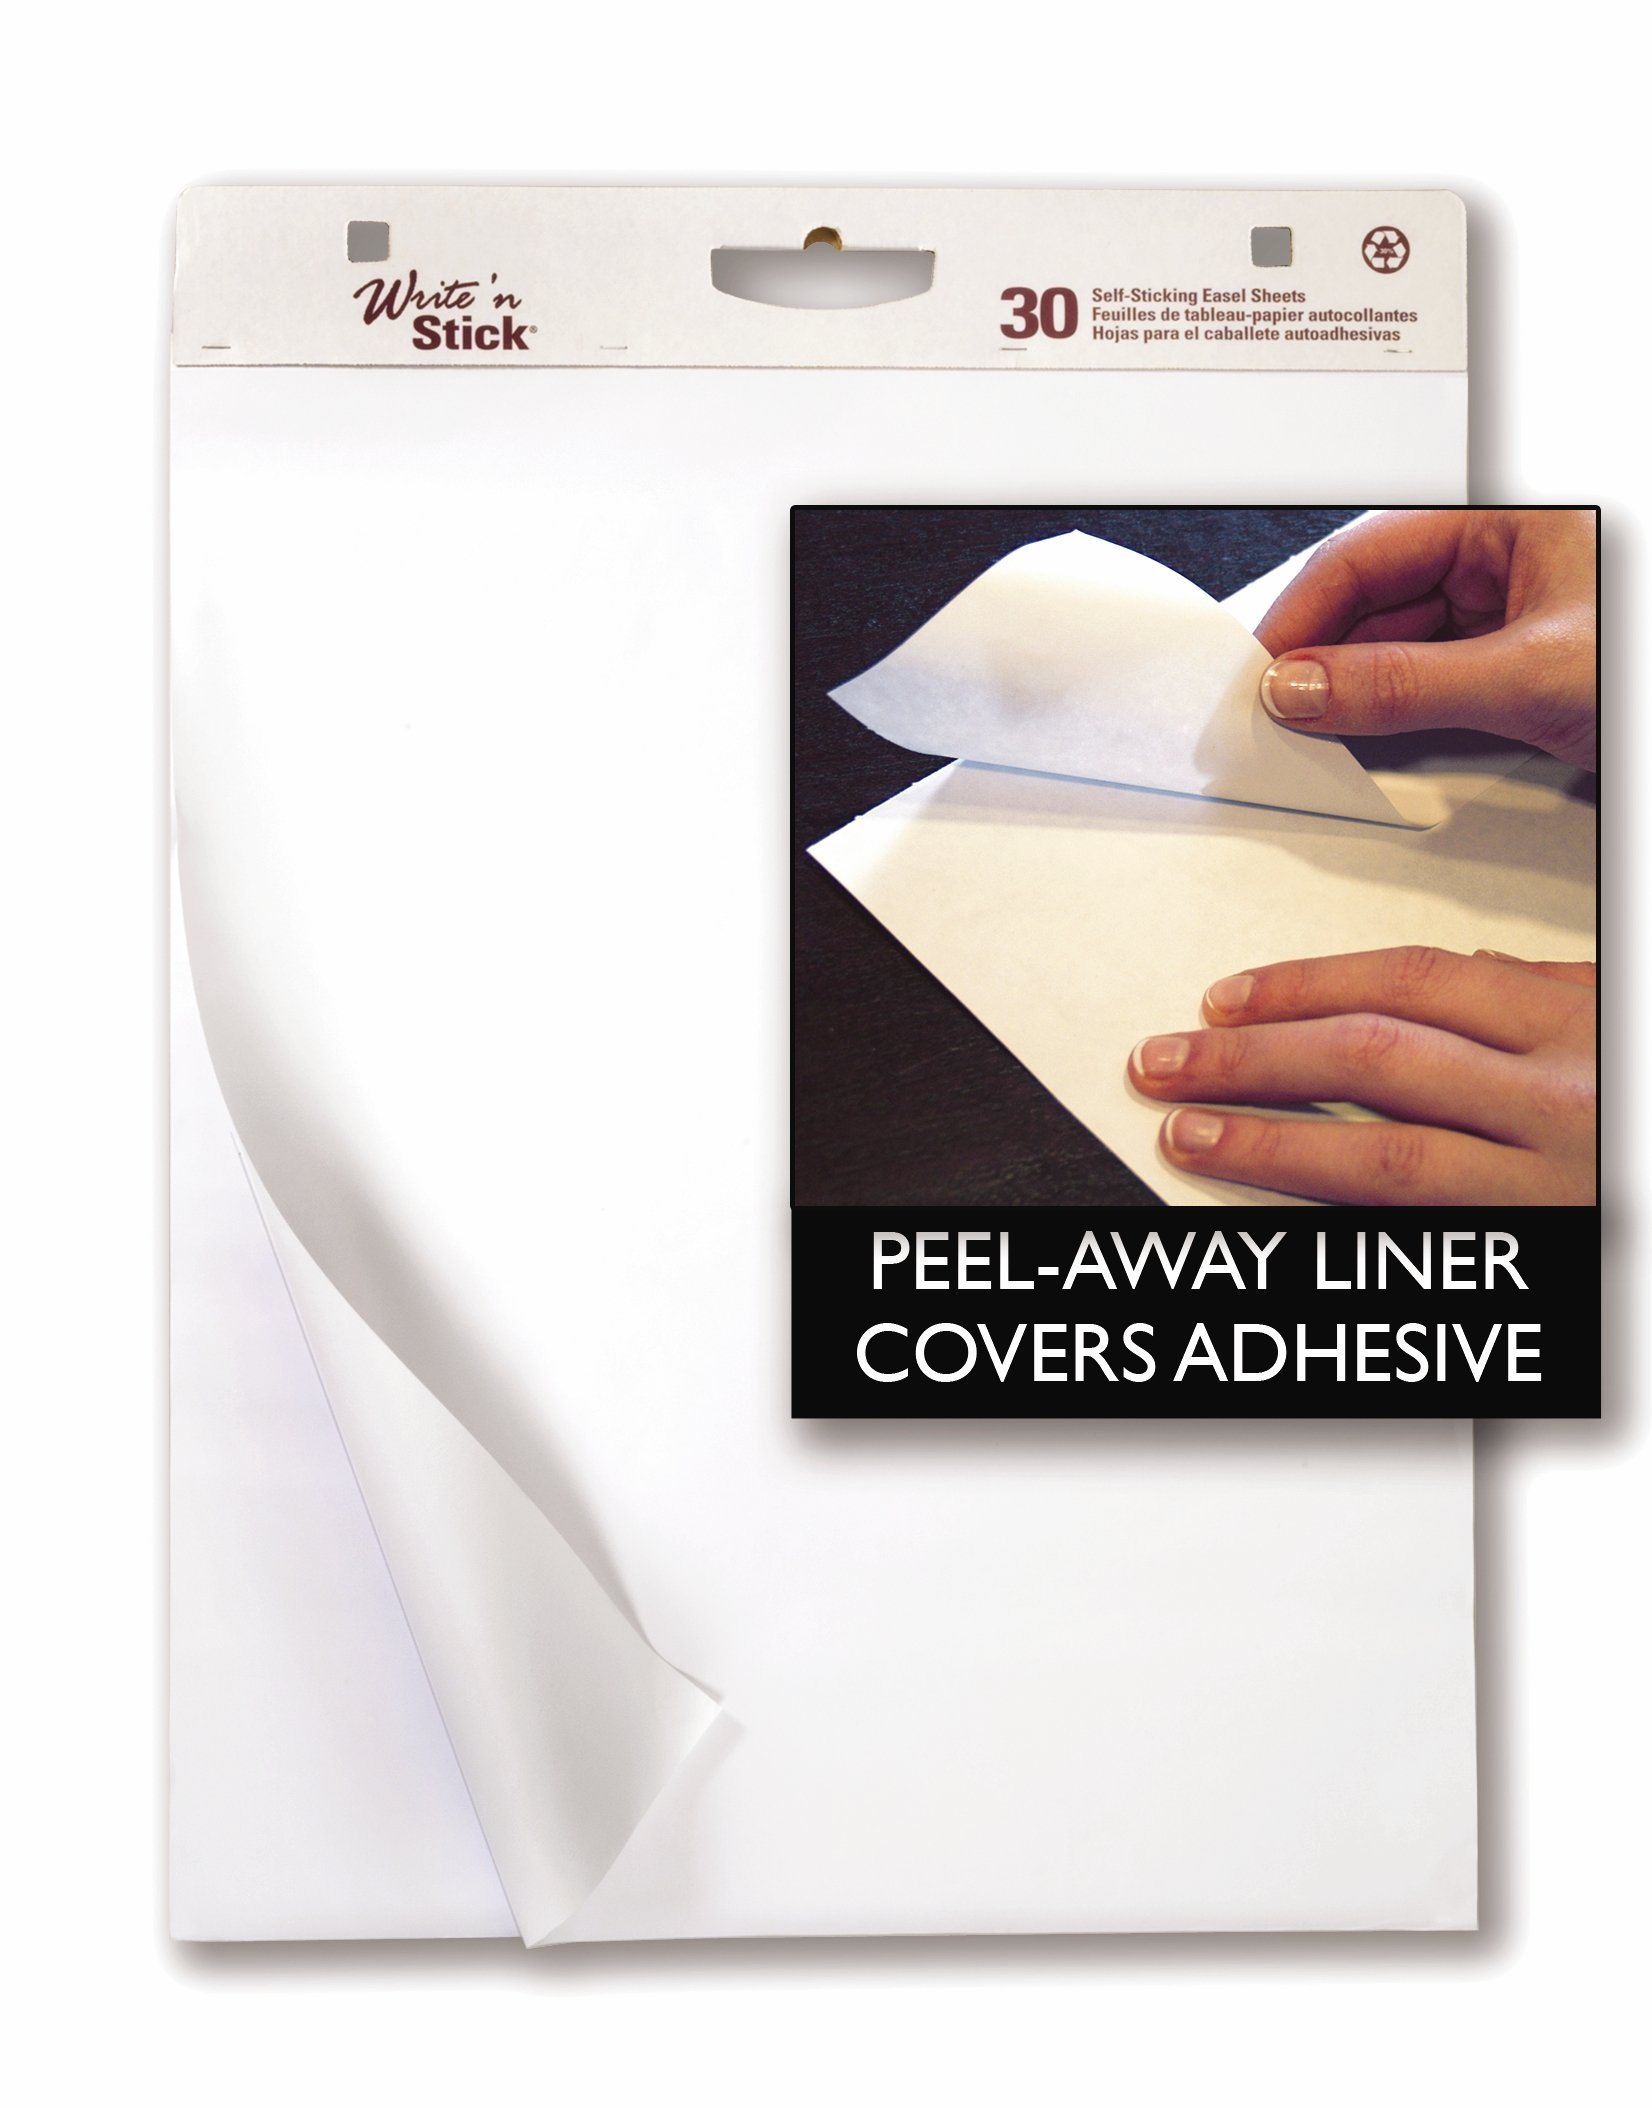 Adams Write'n Stick Easel Pad, 25 x 30 Inch, 2-Pack, 30 Sheets per Pad, White (WSP25302W)